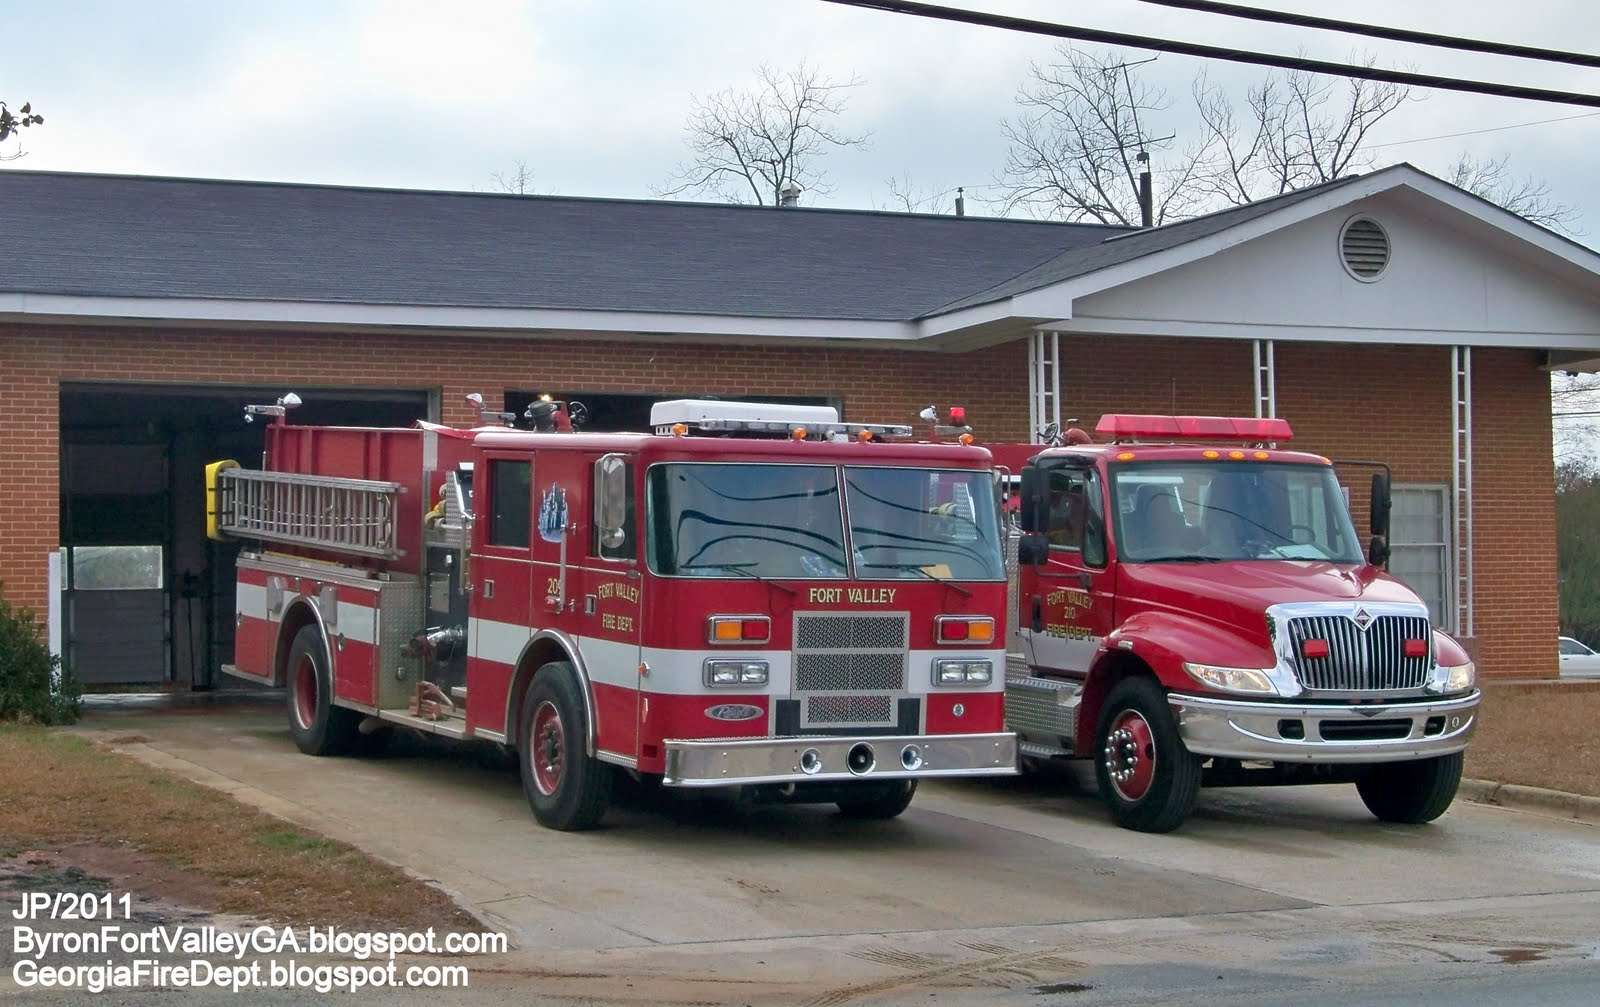 Albany Chevy Fire Dept. Trucks GA. FL. AL. Rescue Station Firemen ...